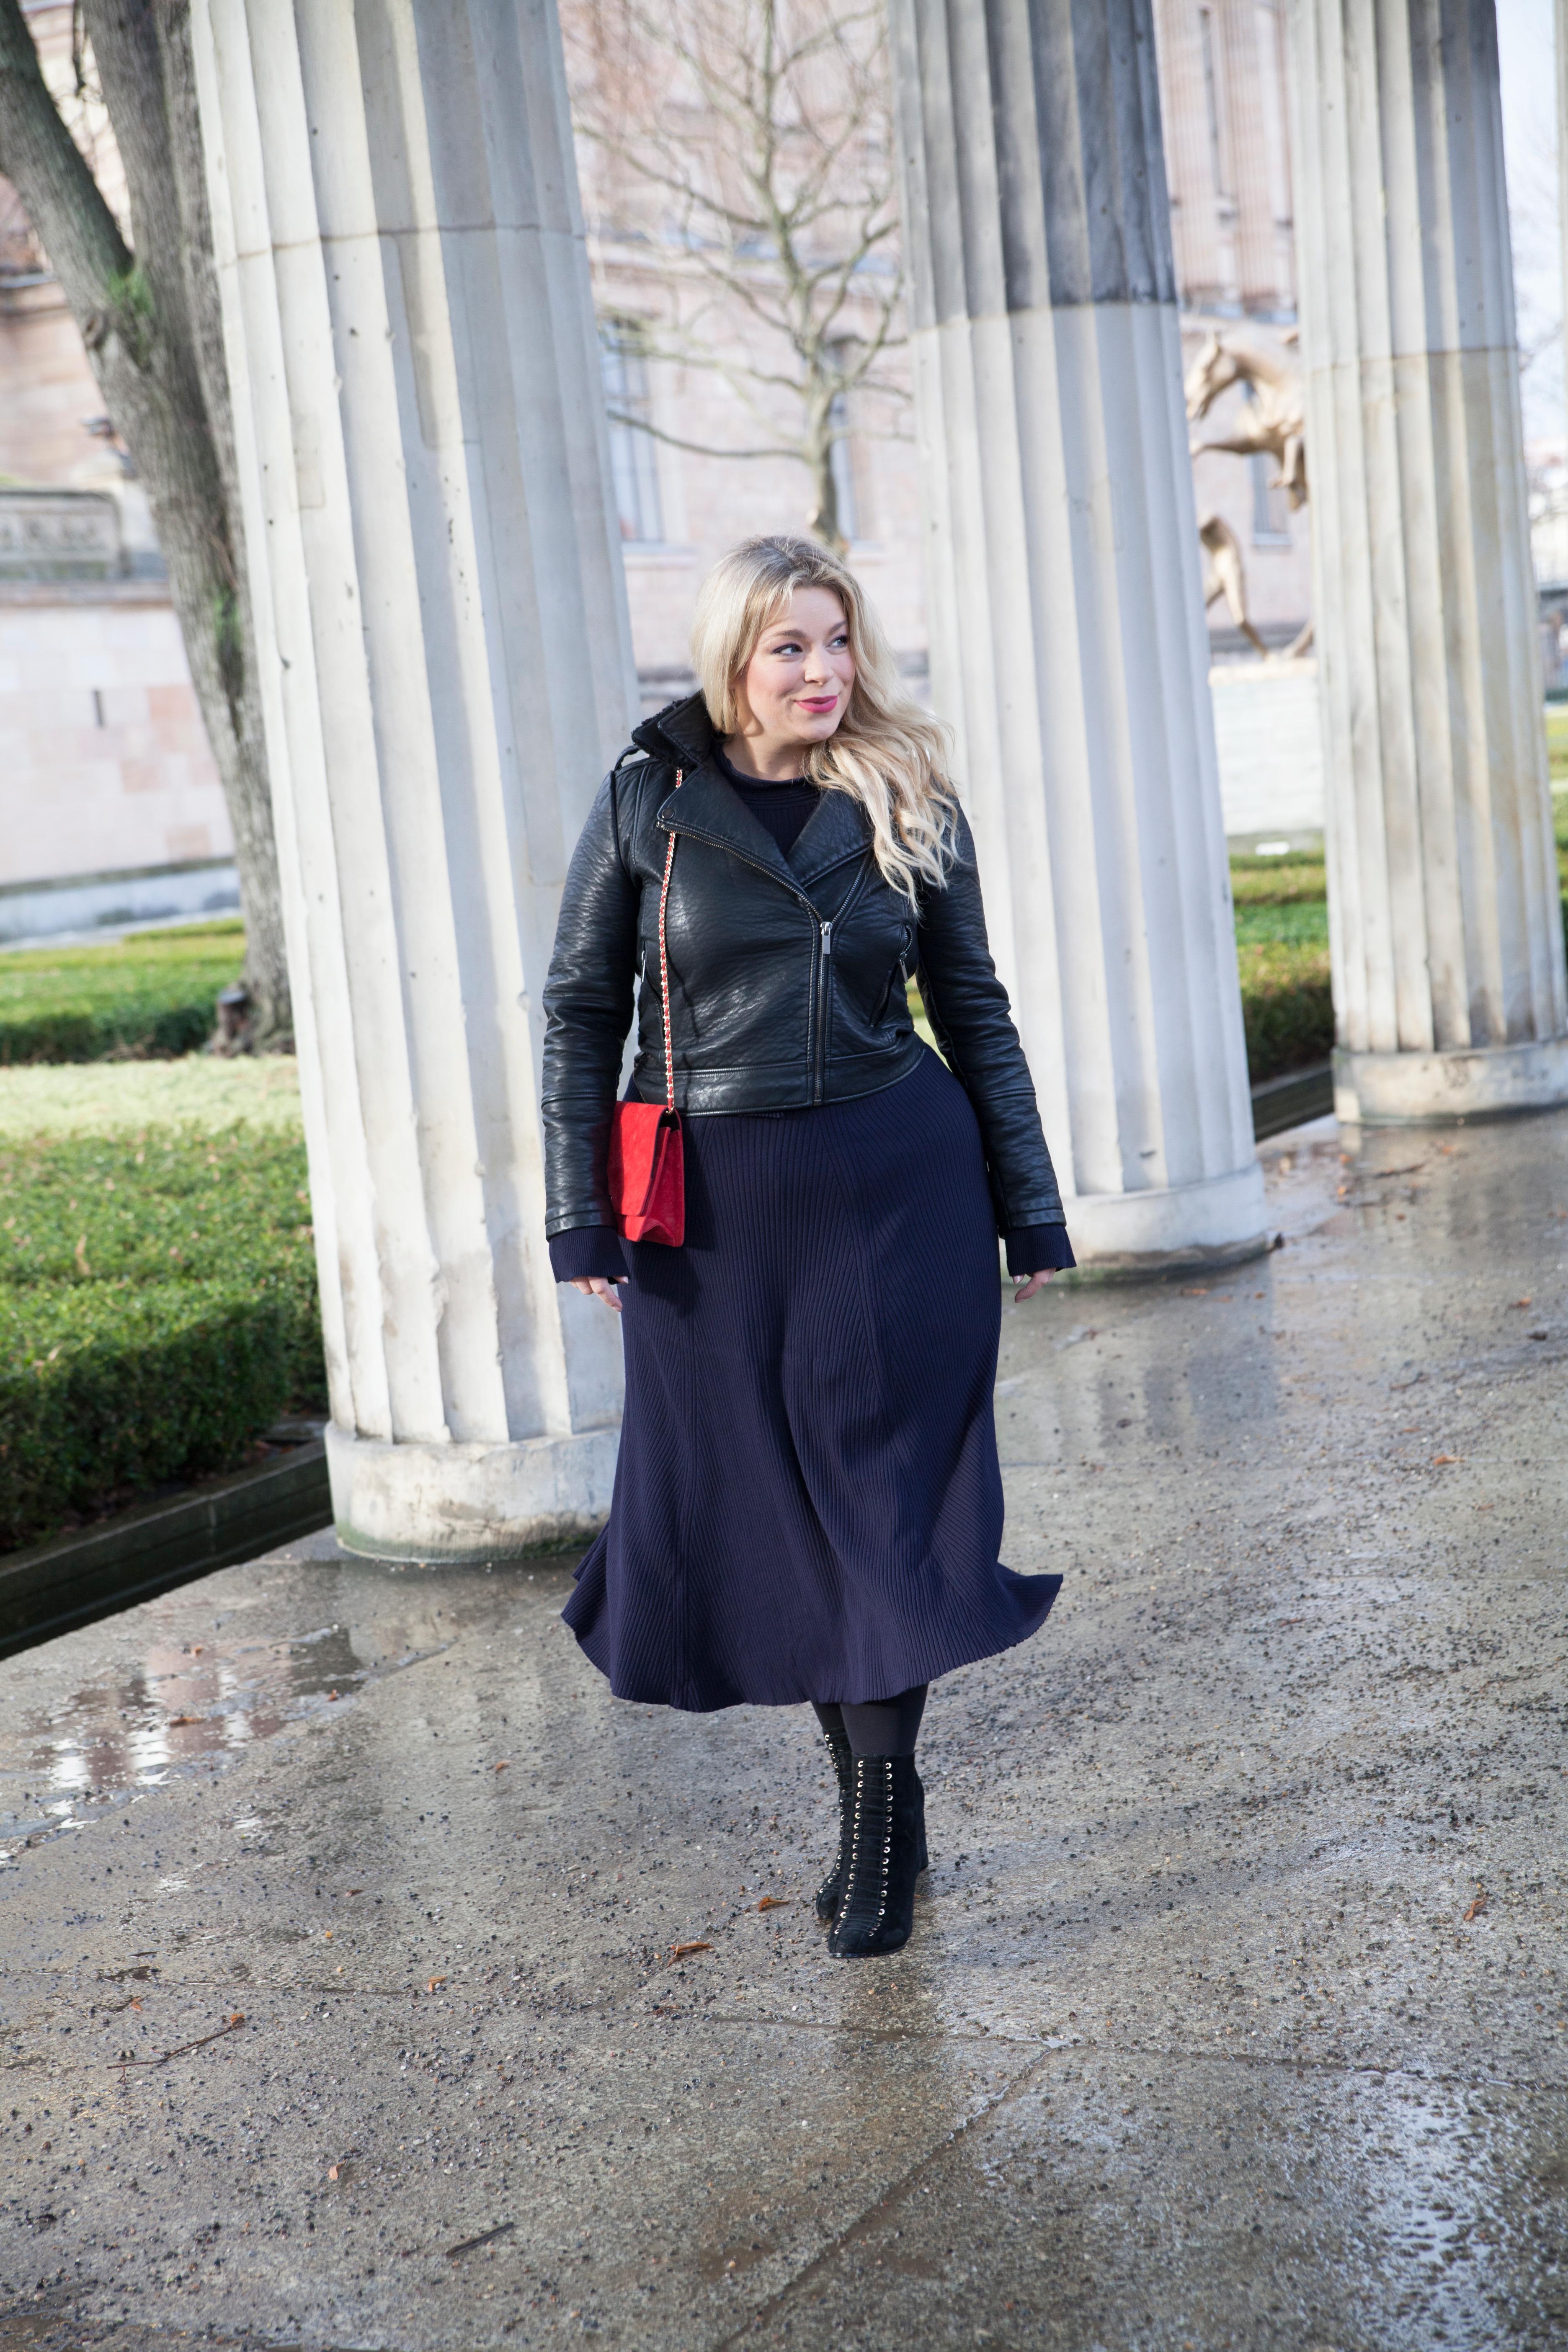 Caterina-pogorzelski-Tv-Moderatorin-Outift-curvy-Megabambi